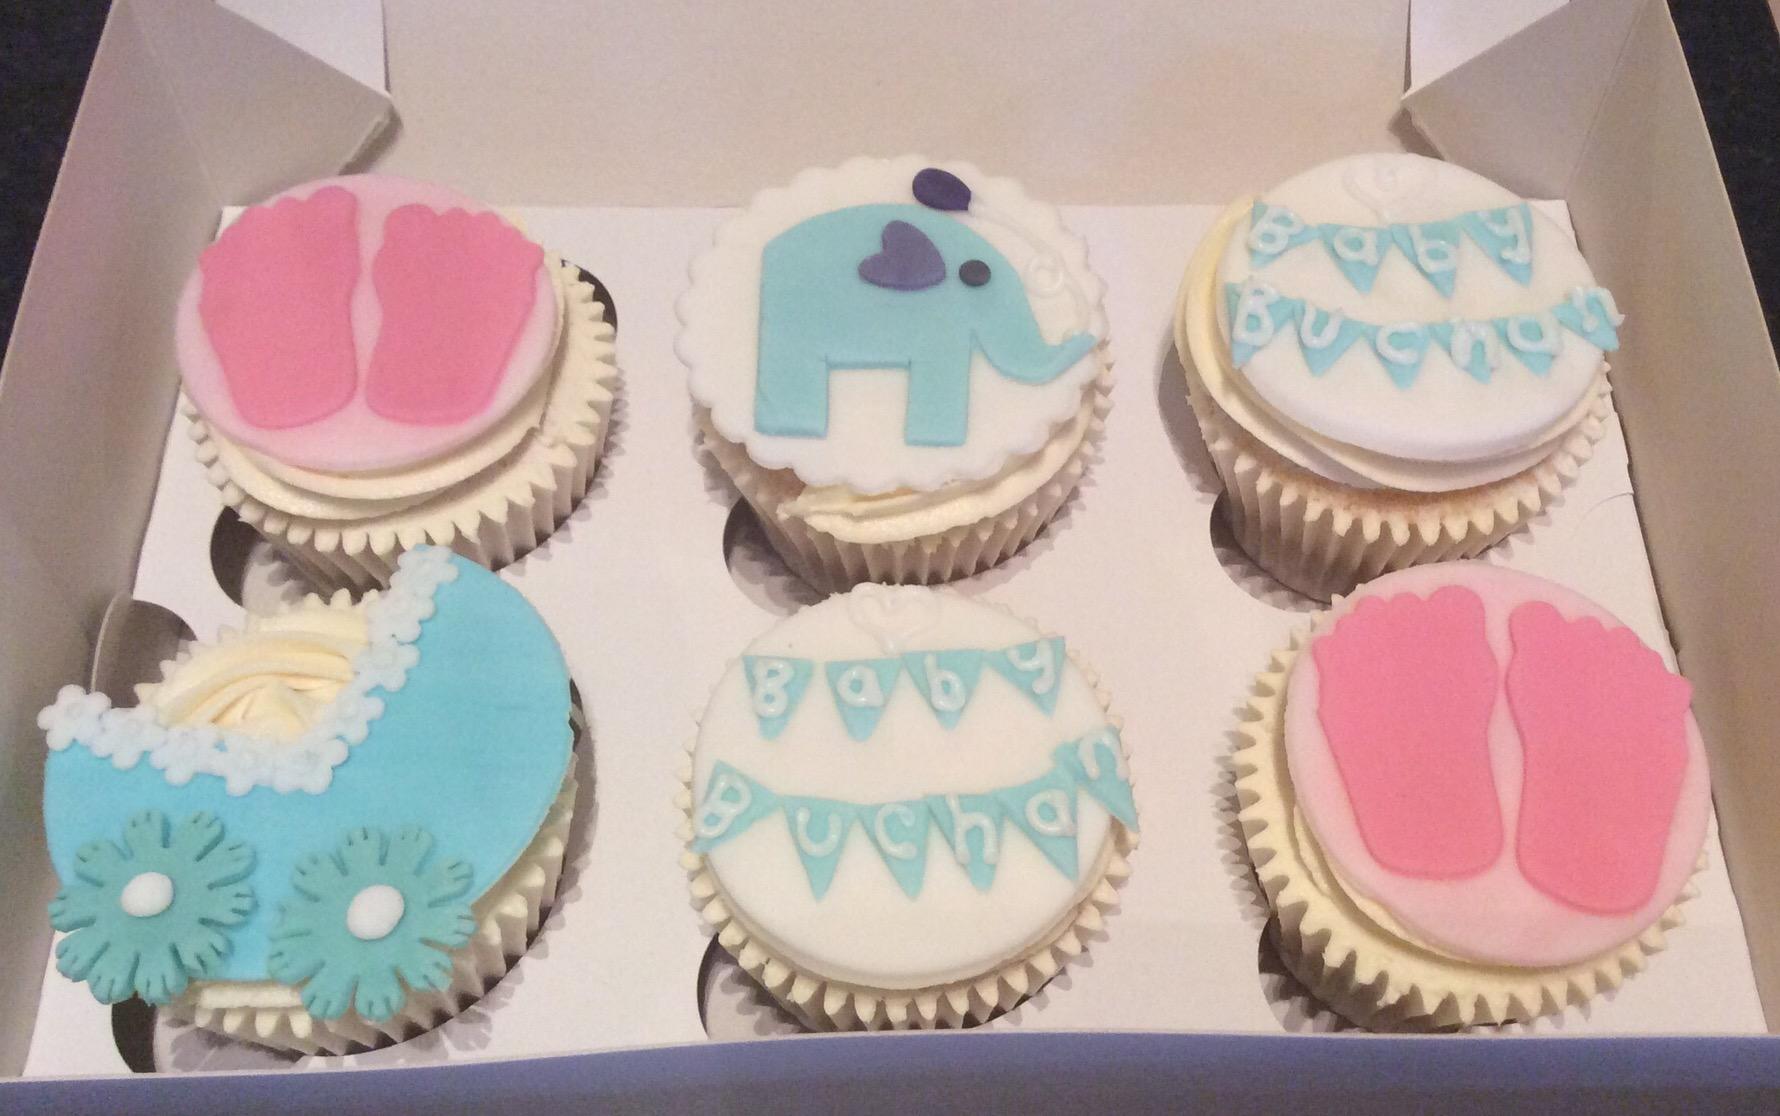 Baby Shower Cakes East Kilbride ~ Baby shower cupcakesu girl or boy u cakes by lizzie edinburgh